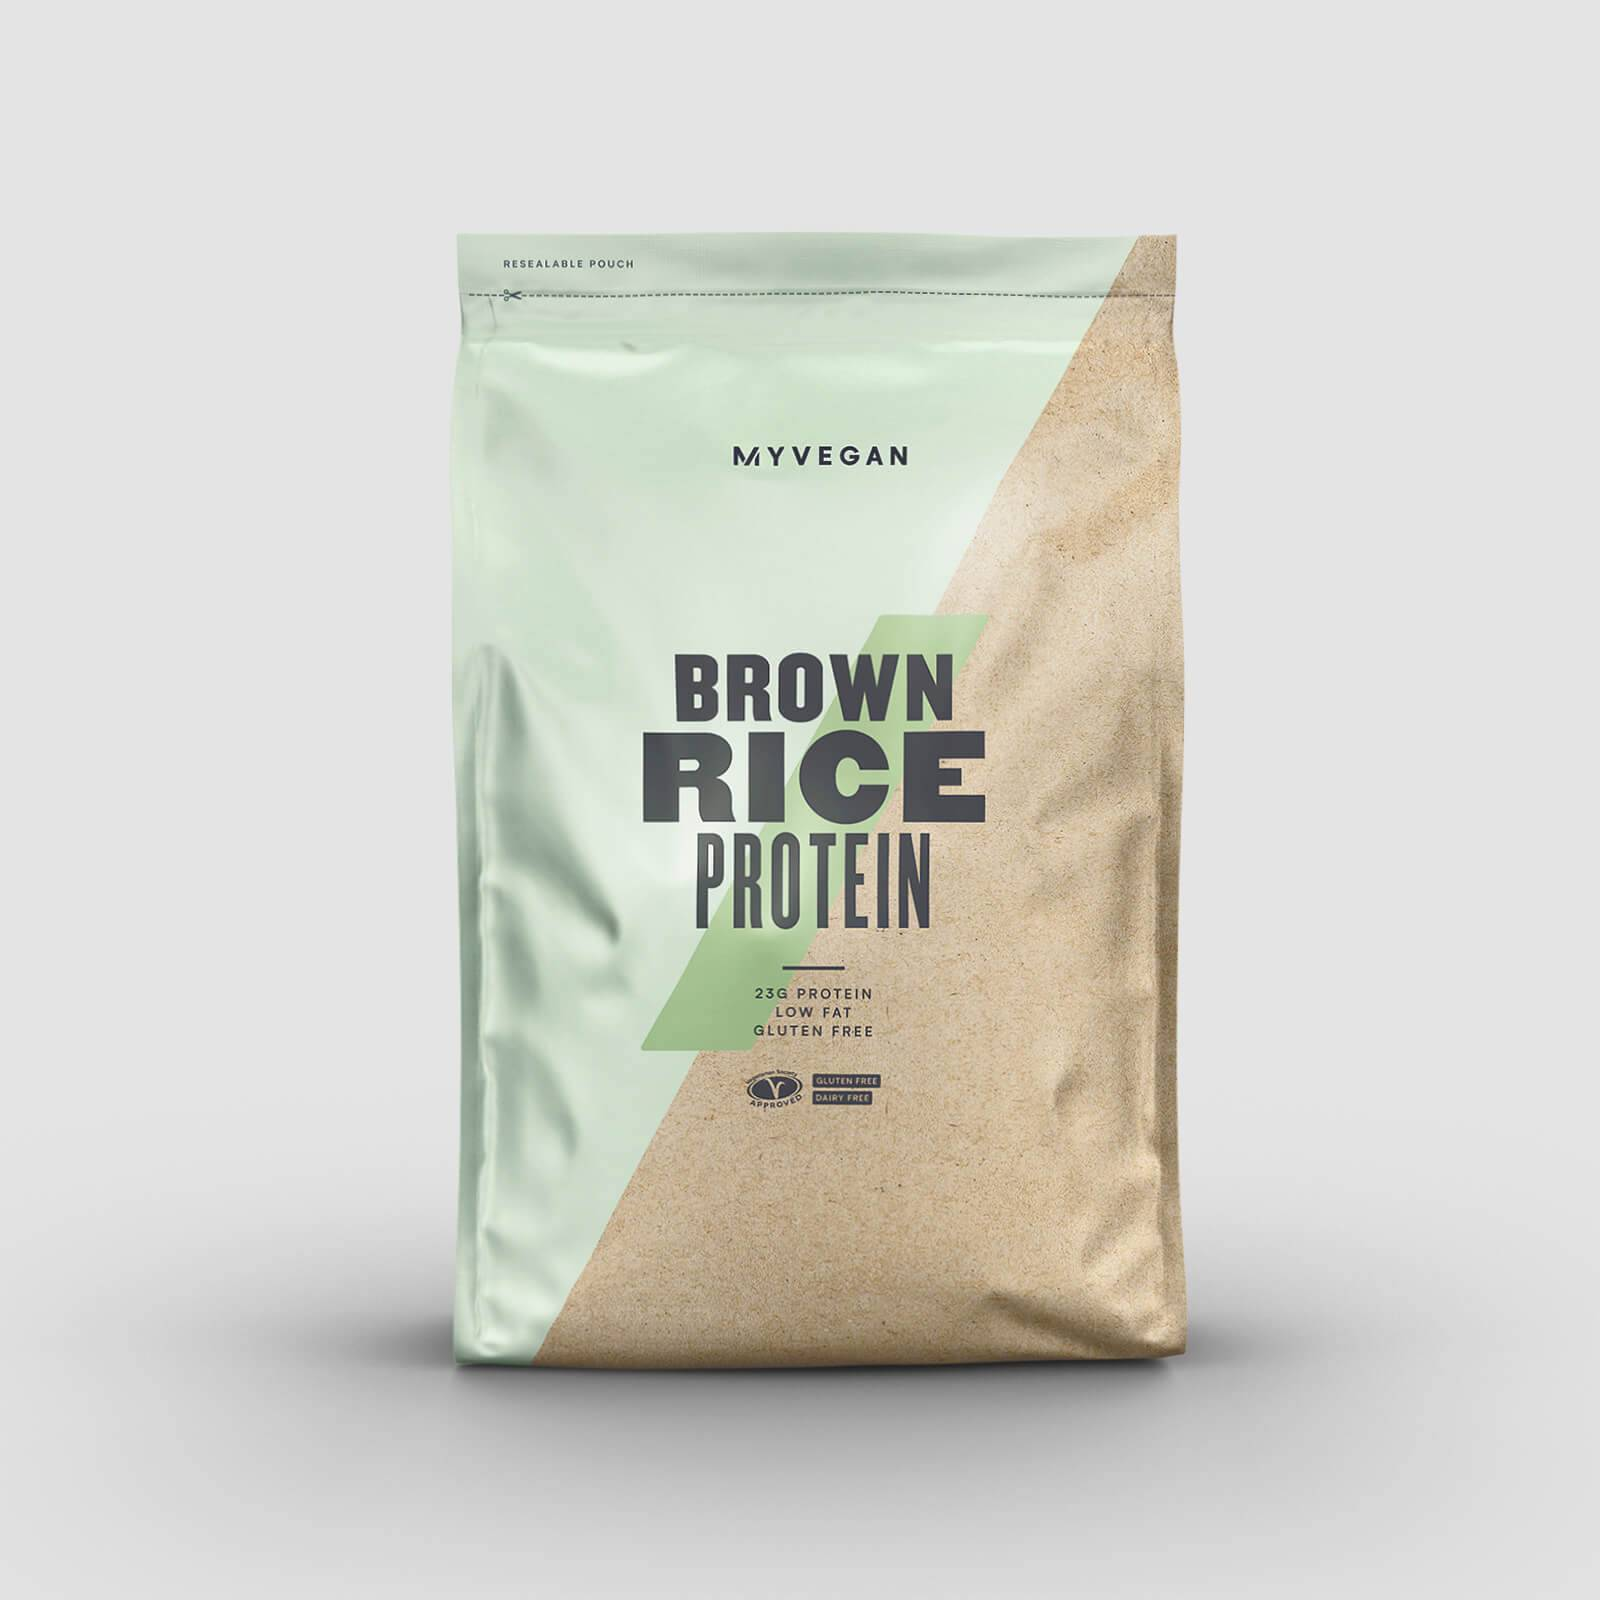 Myprotein Brown Rice Protein - 5.5lb - Unflavored